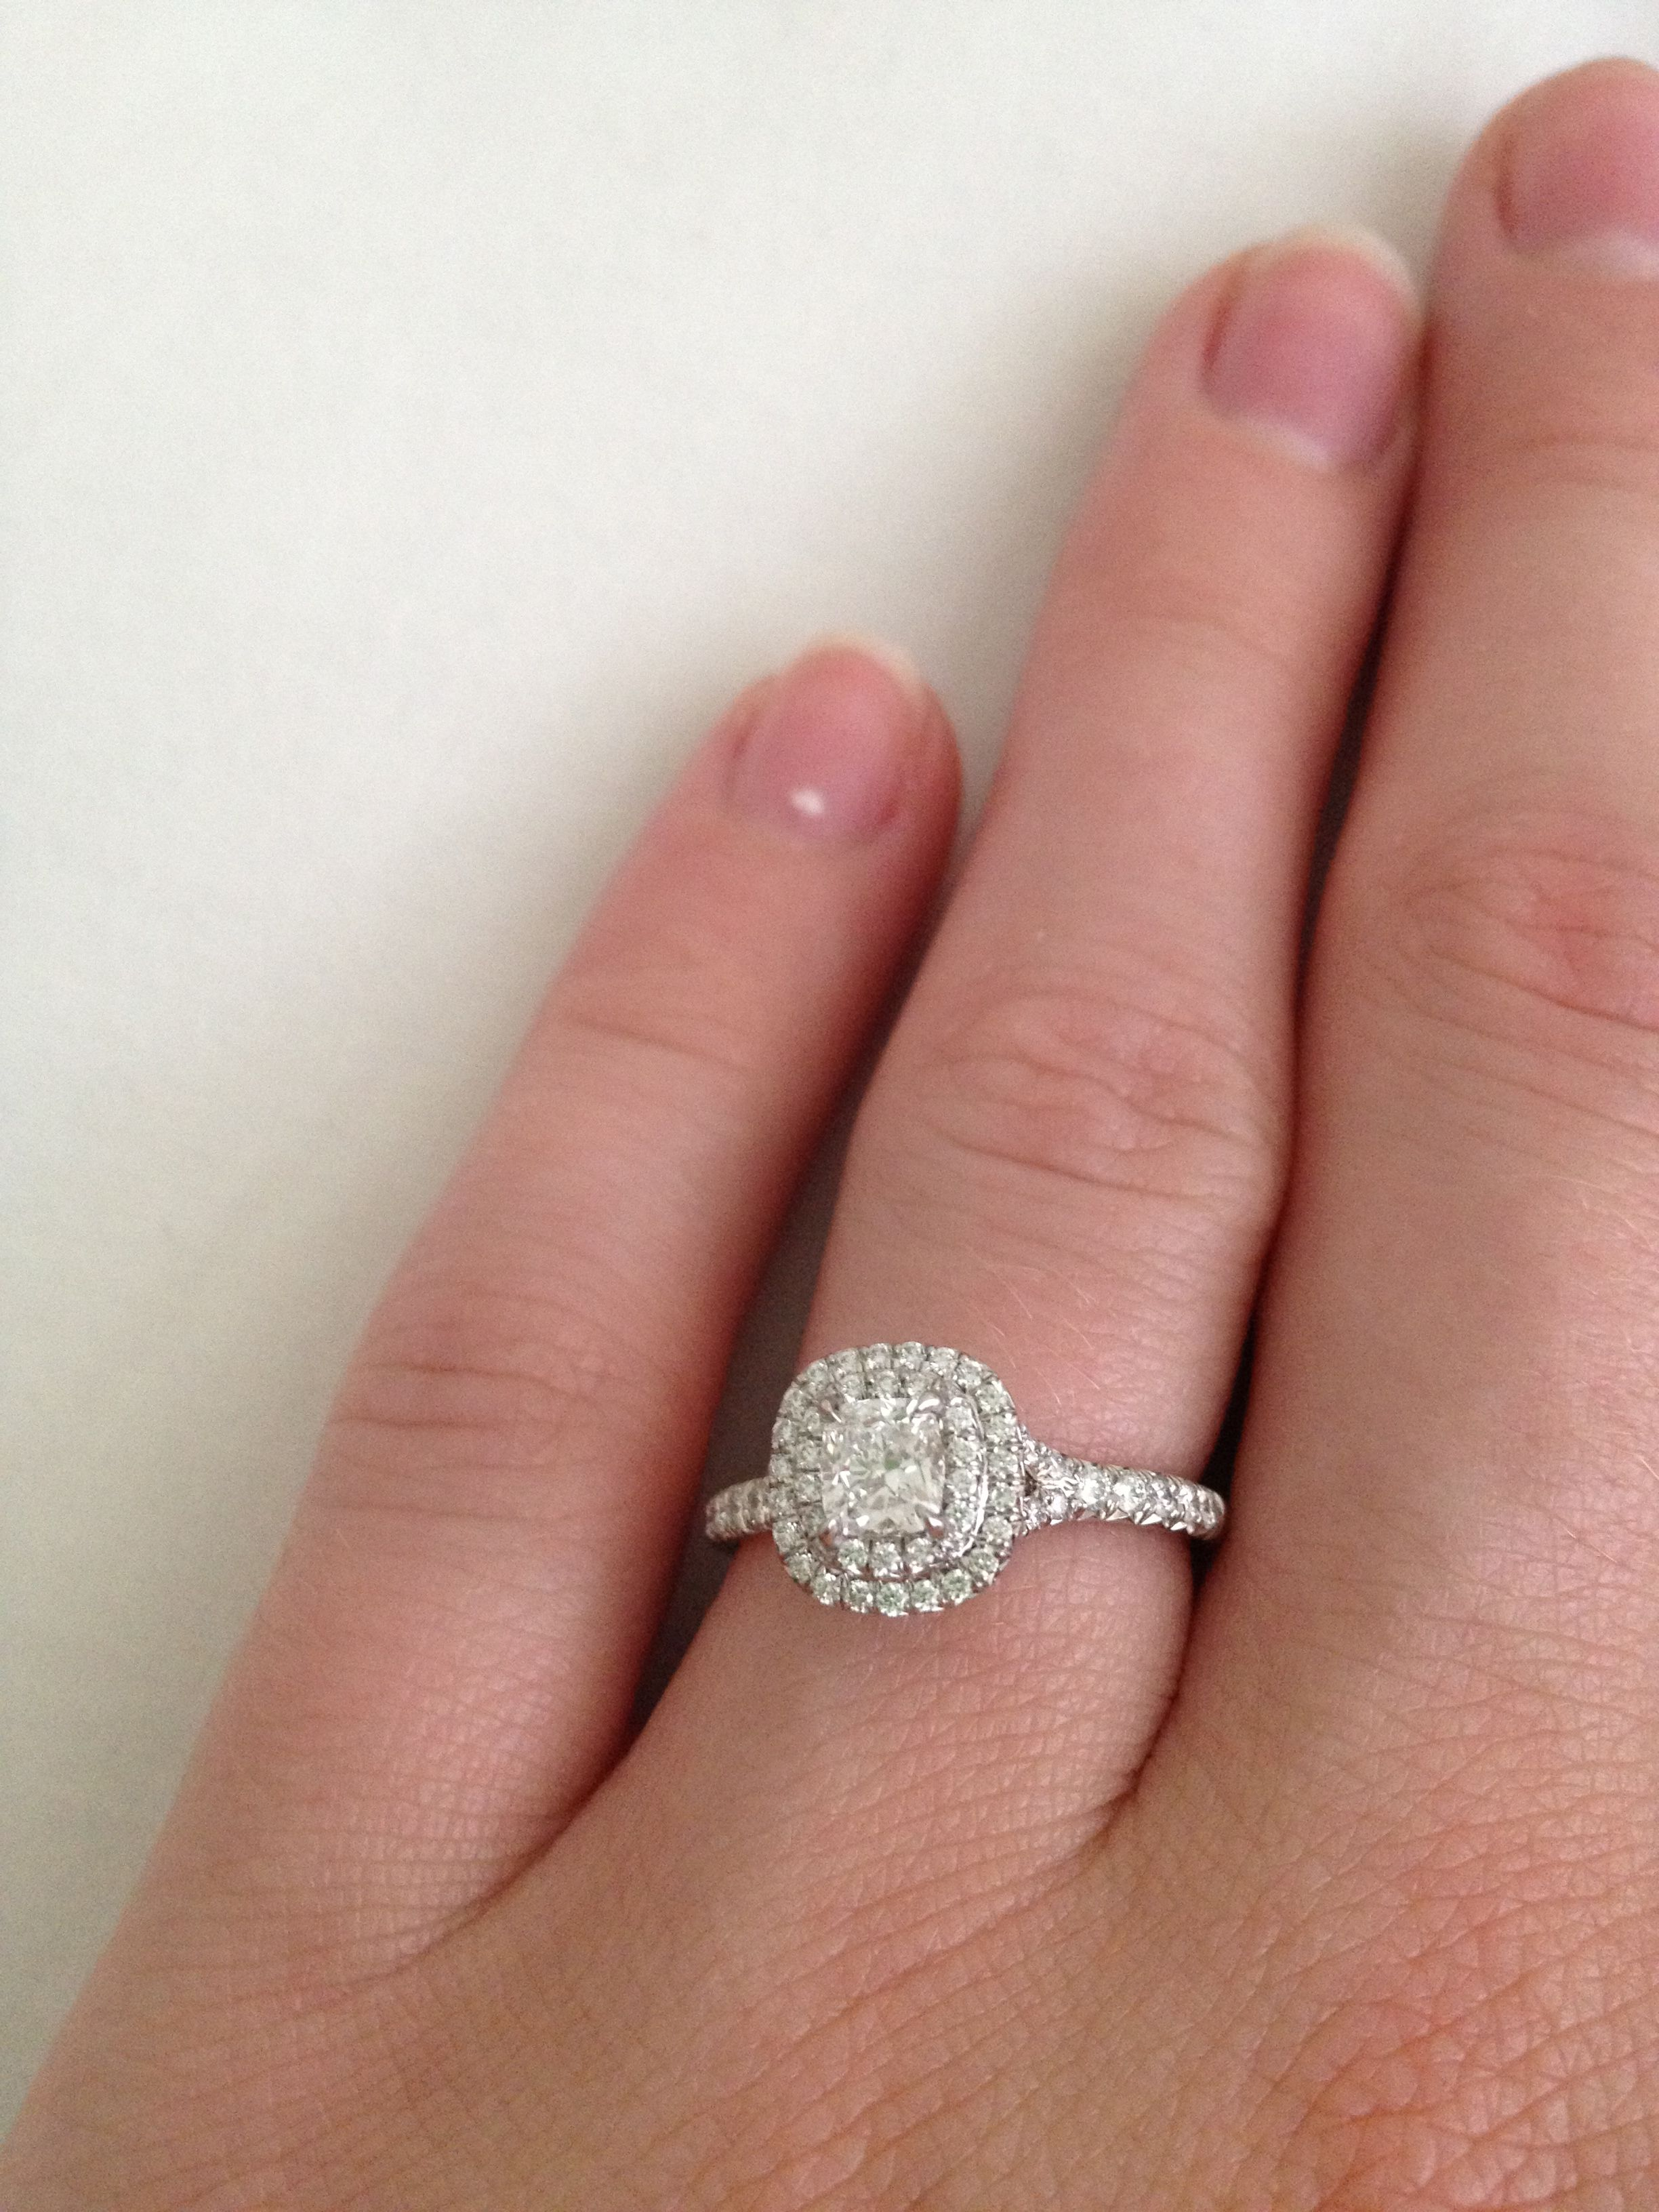 Tiffany & Co Soleste Engagement Ring | Dream Wedding | Pinterest ...